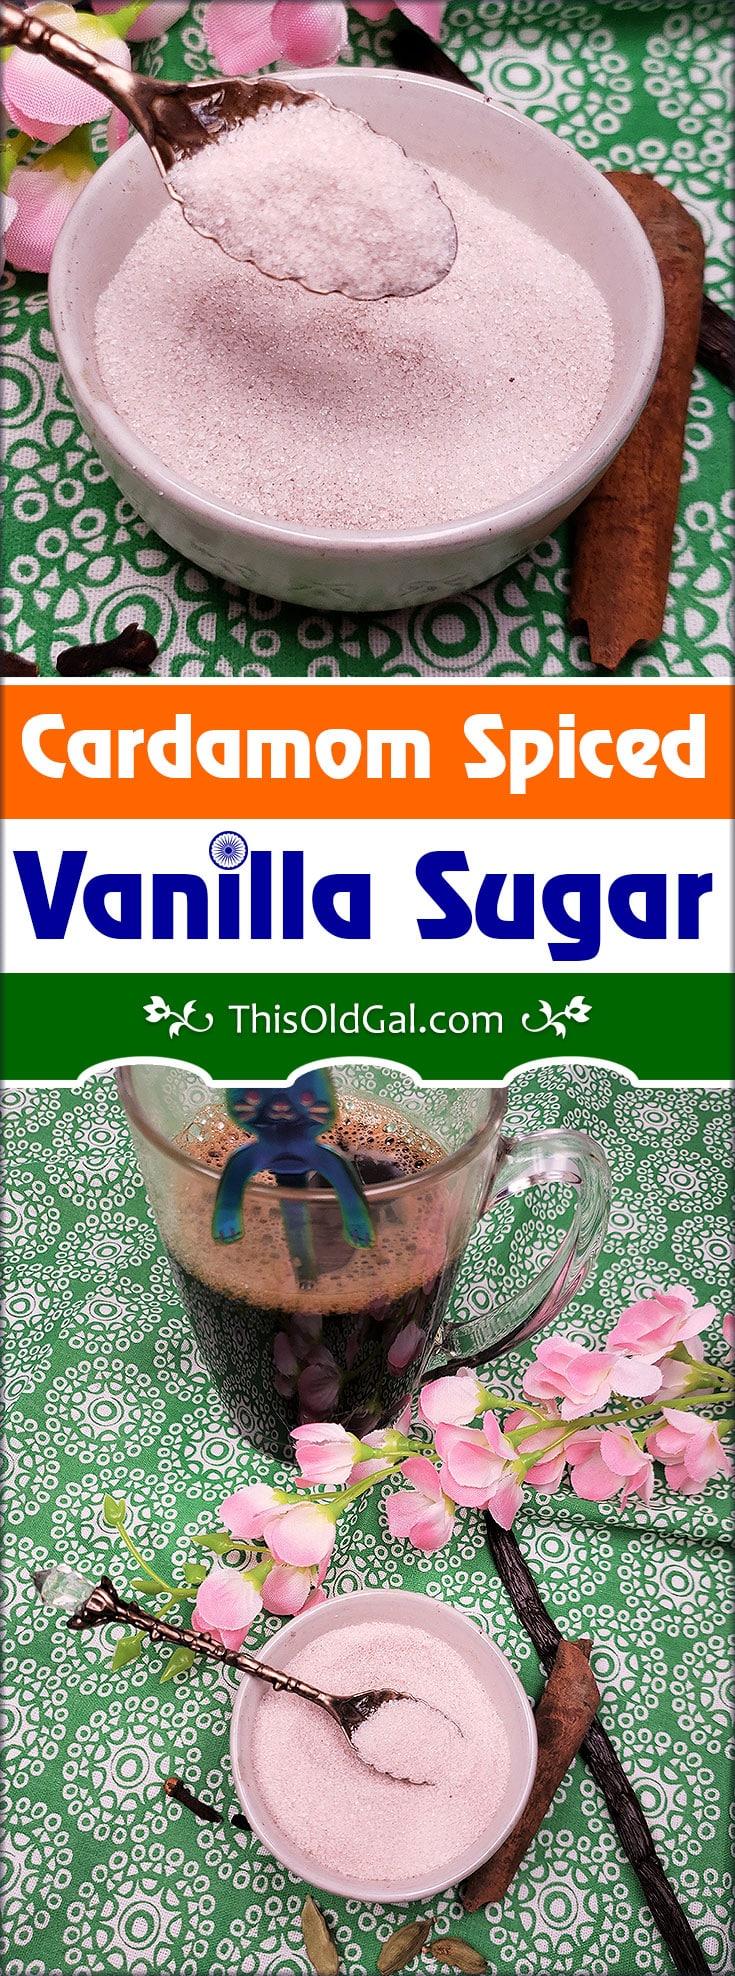 Cardamon Spiced Vanilla Sugar